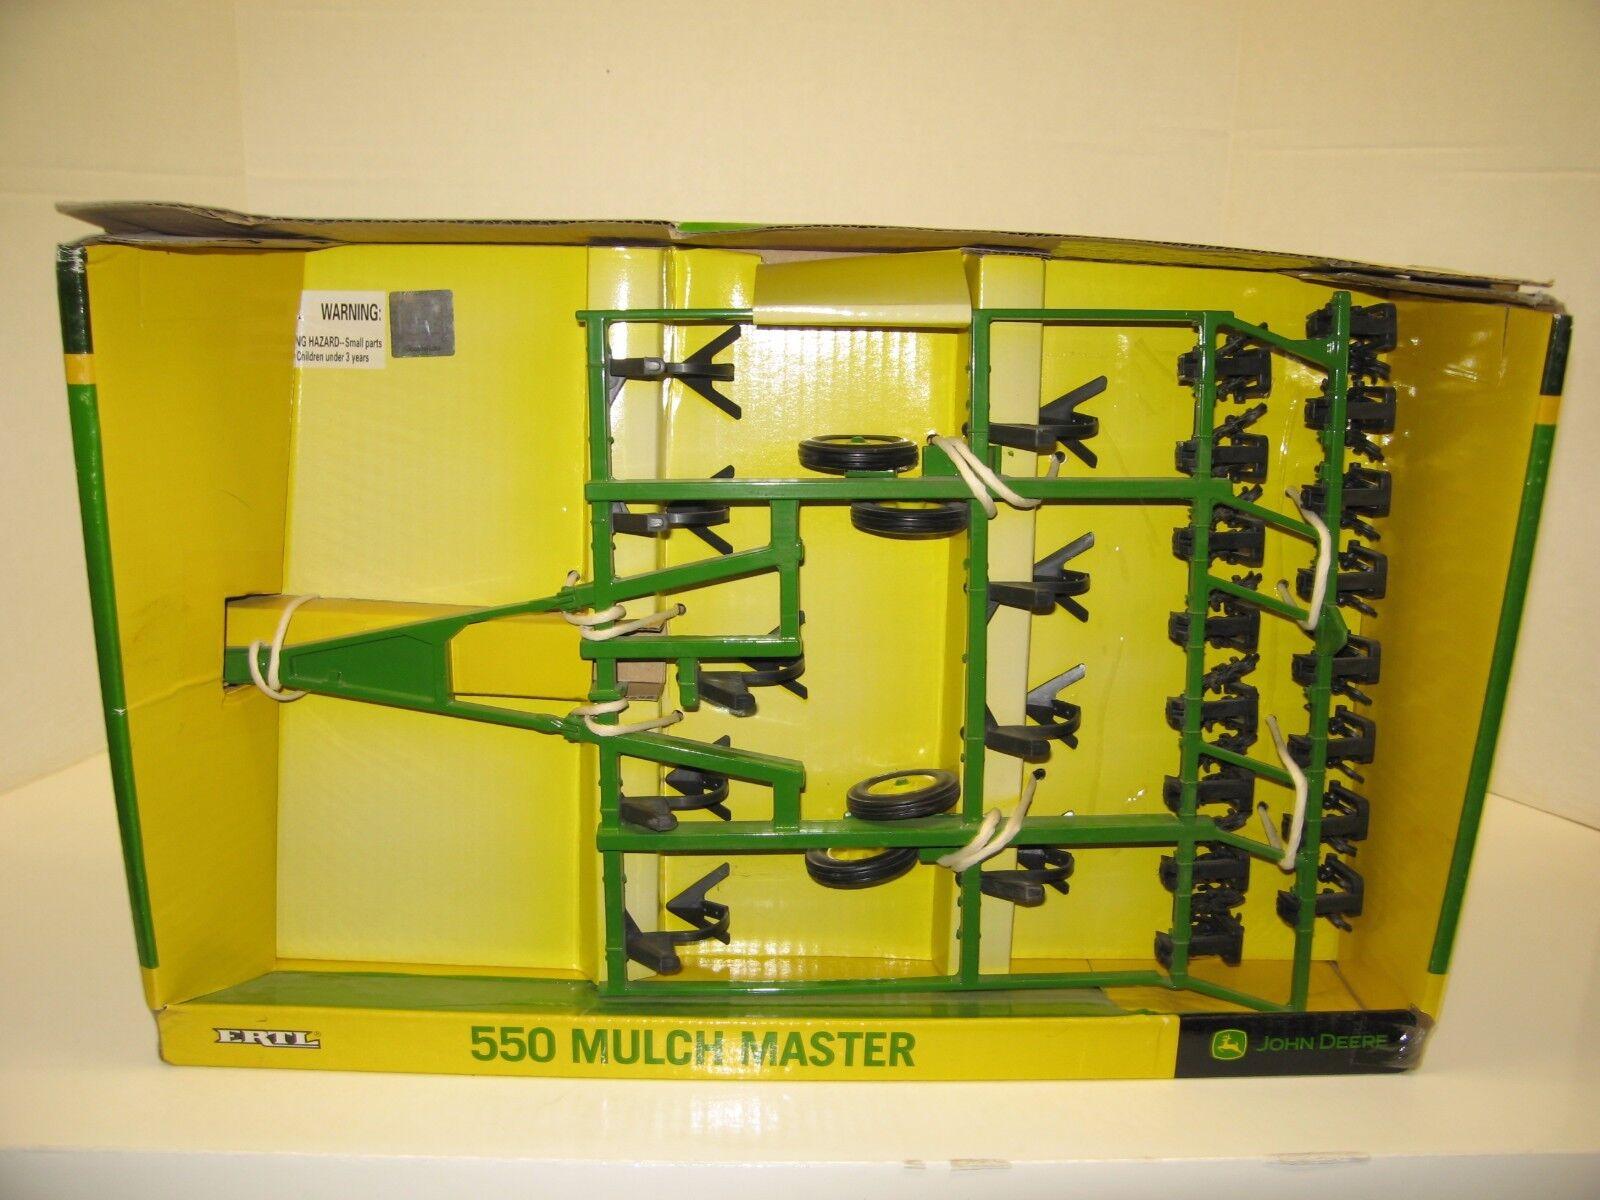 1 16 JOHN DEERE 550 MULCH MASTER NIB free shipping